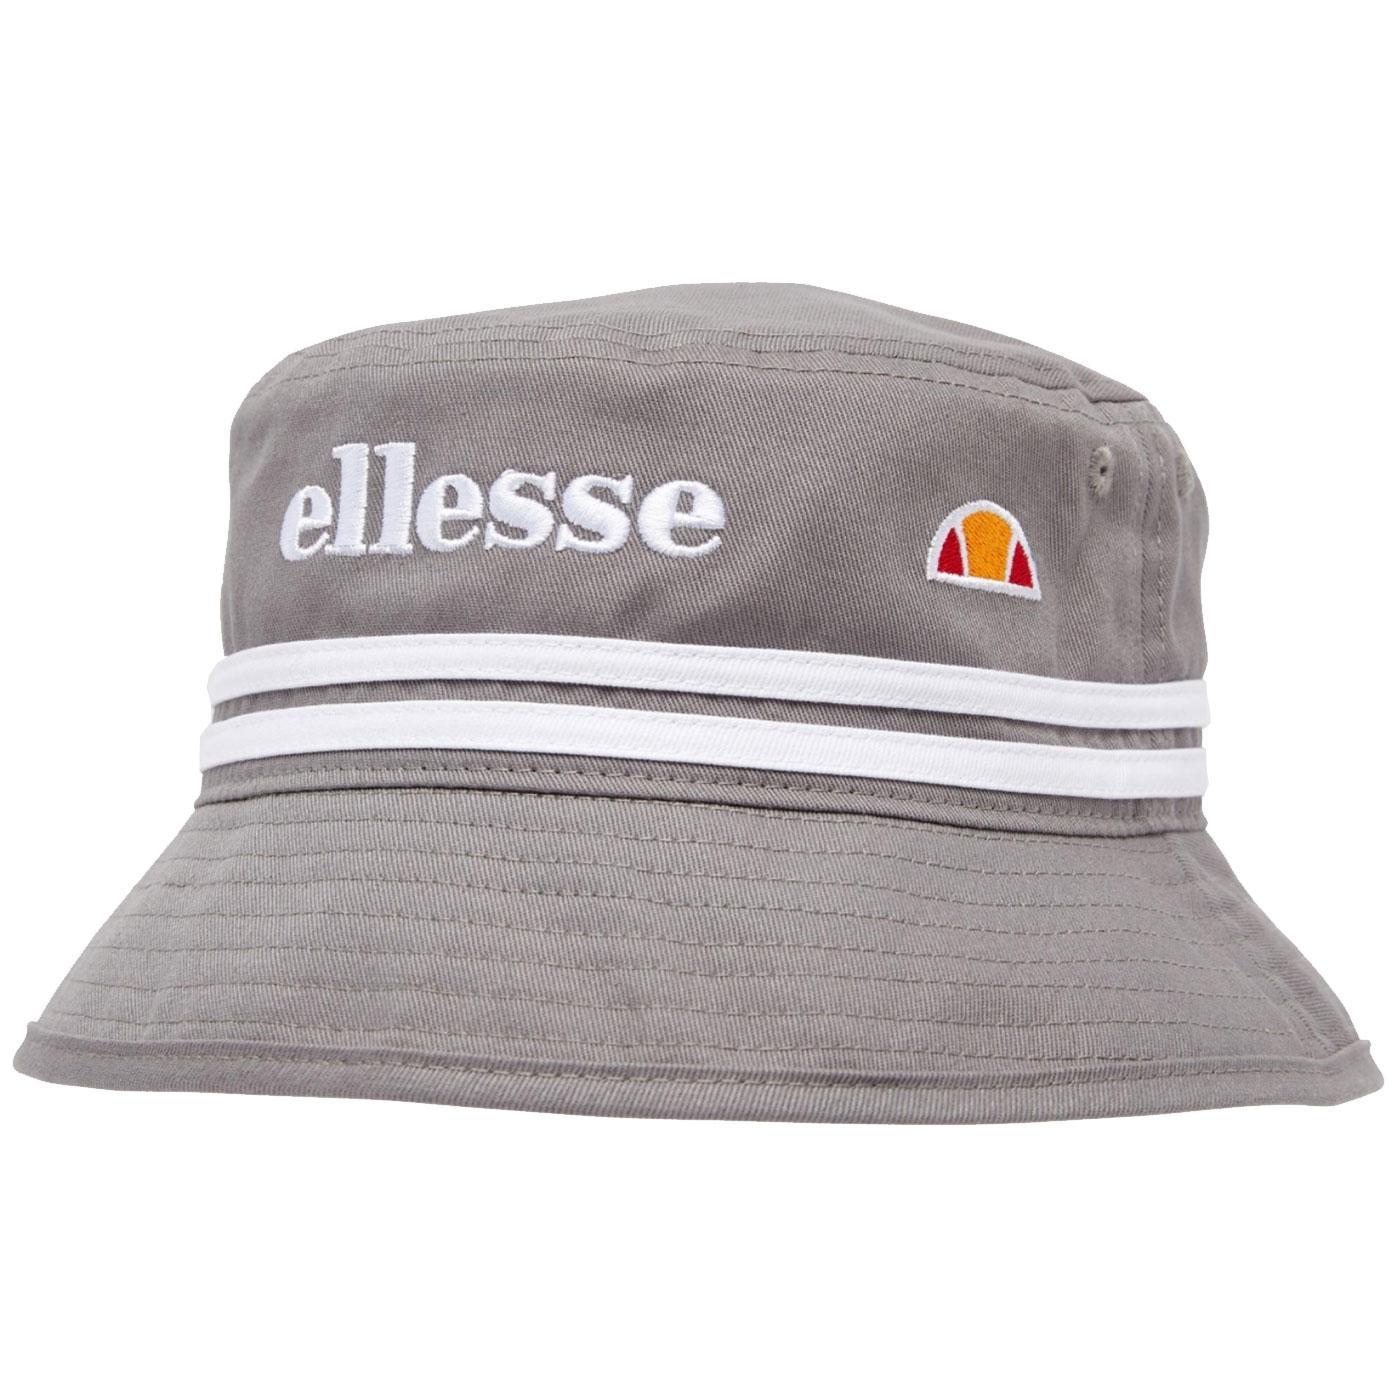 Lorenzo ELLESSE Retro 90s Striped Bucket Hat Grey